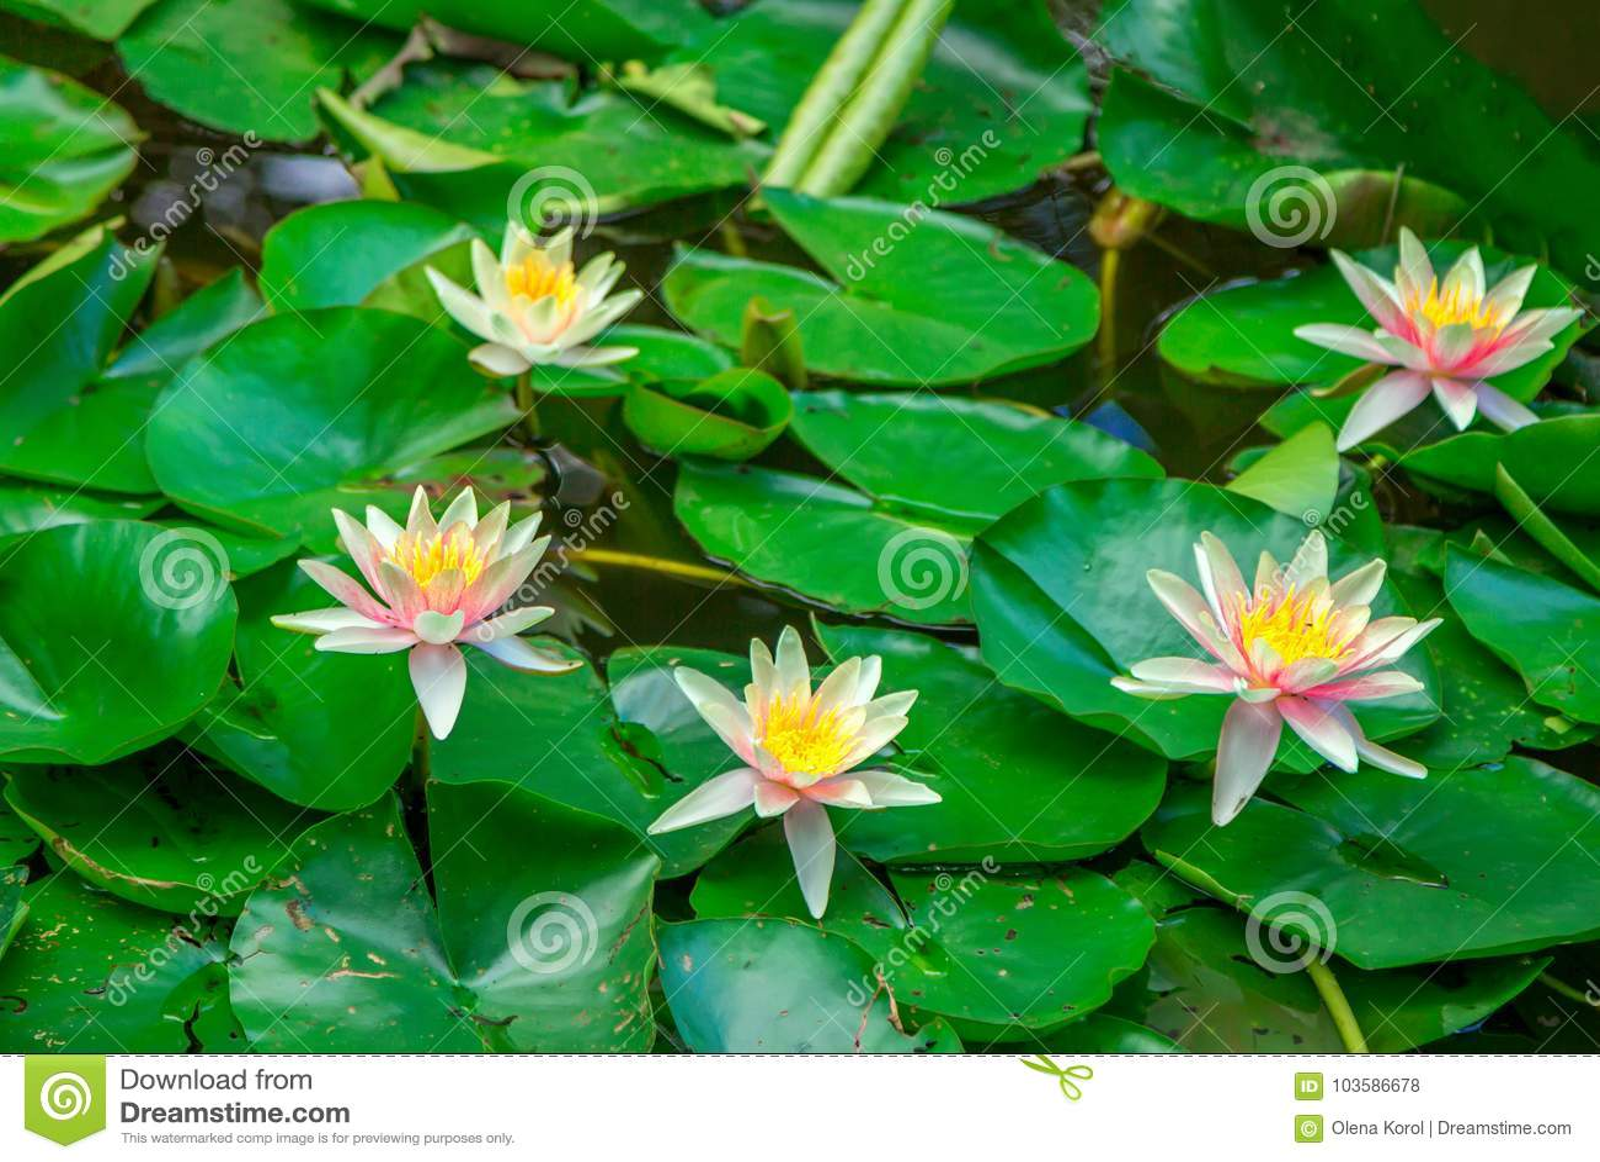 Beautiful pink water lily flowers stock photo image of plant lily beautiful pink water lily flowers izmirmasajfo